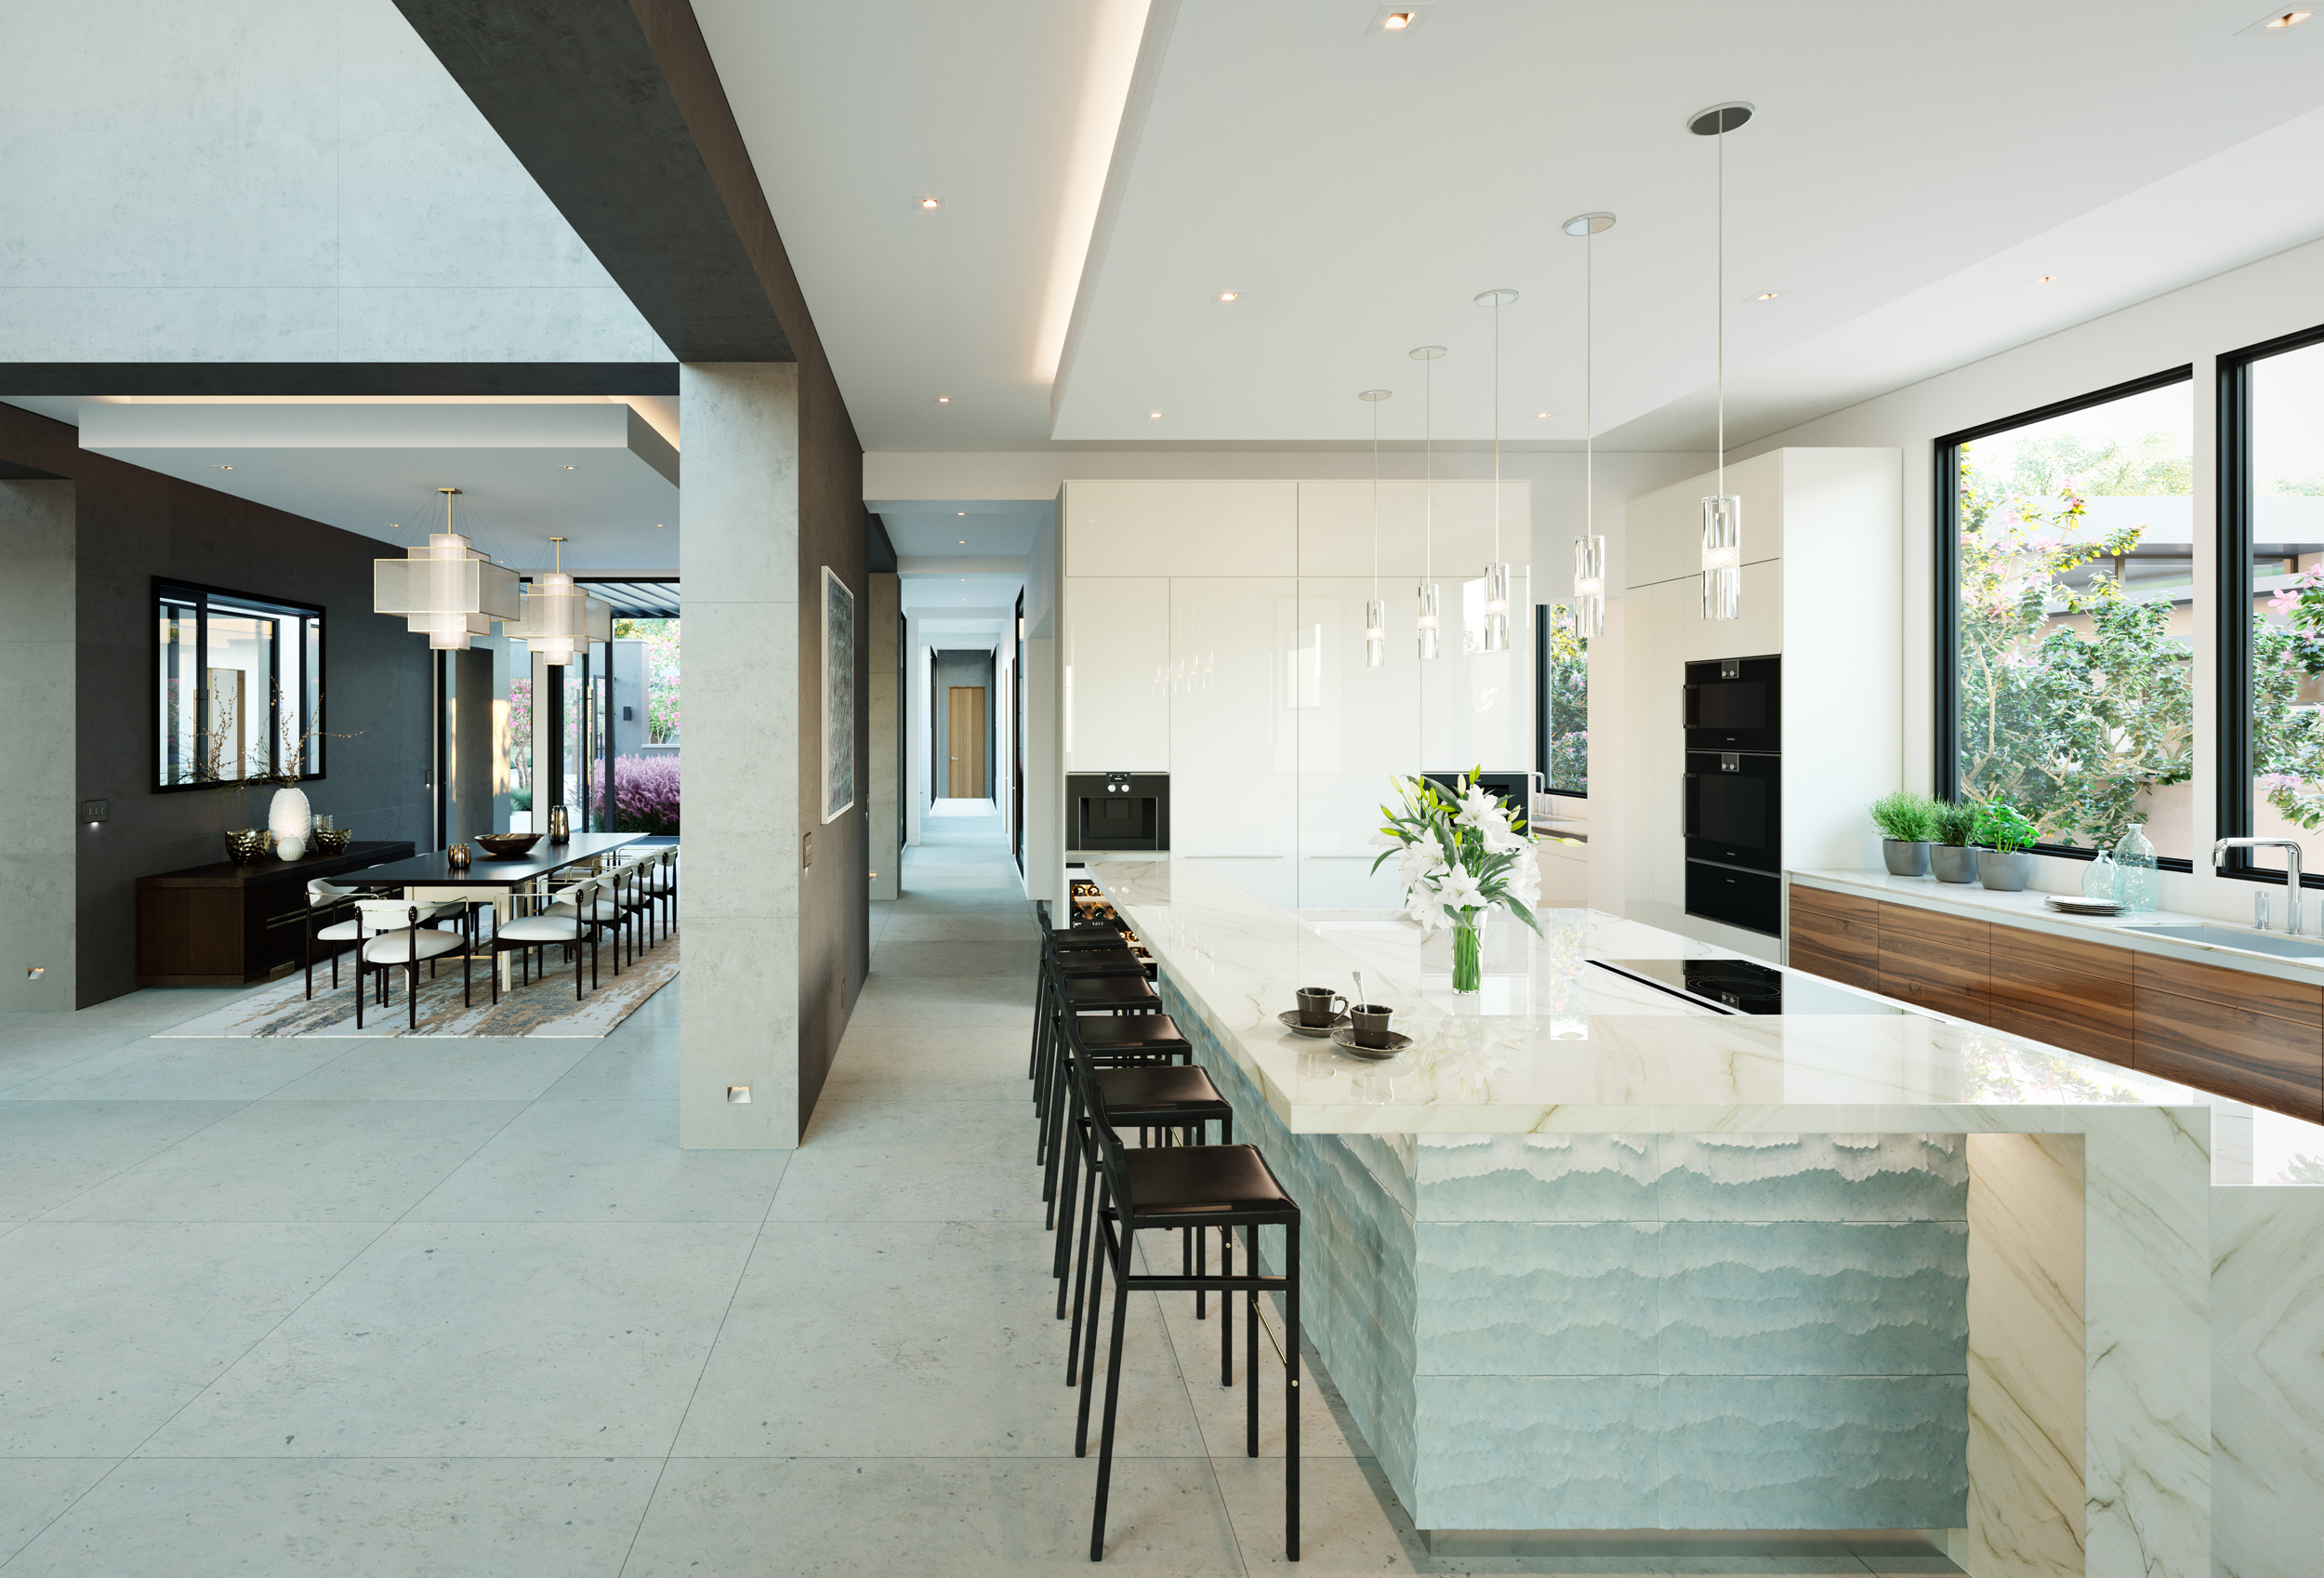 lakehouse_recent_spaces_12_kitchen_04_medium.jpg